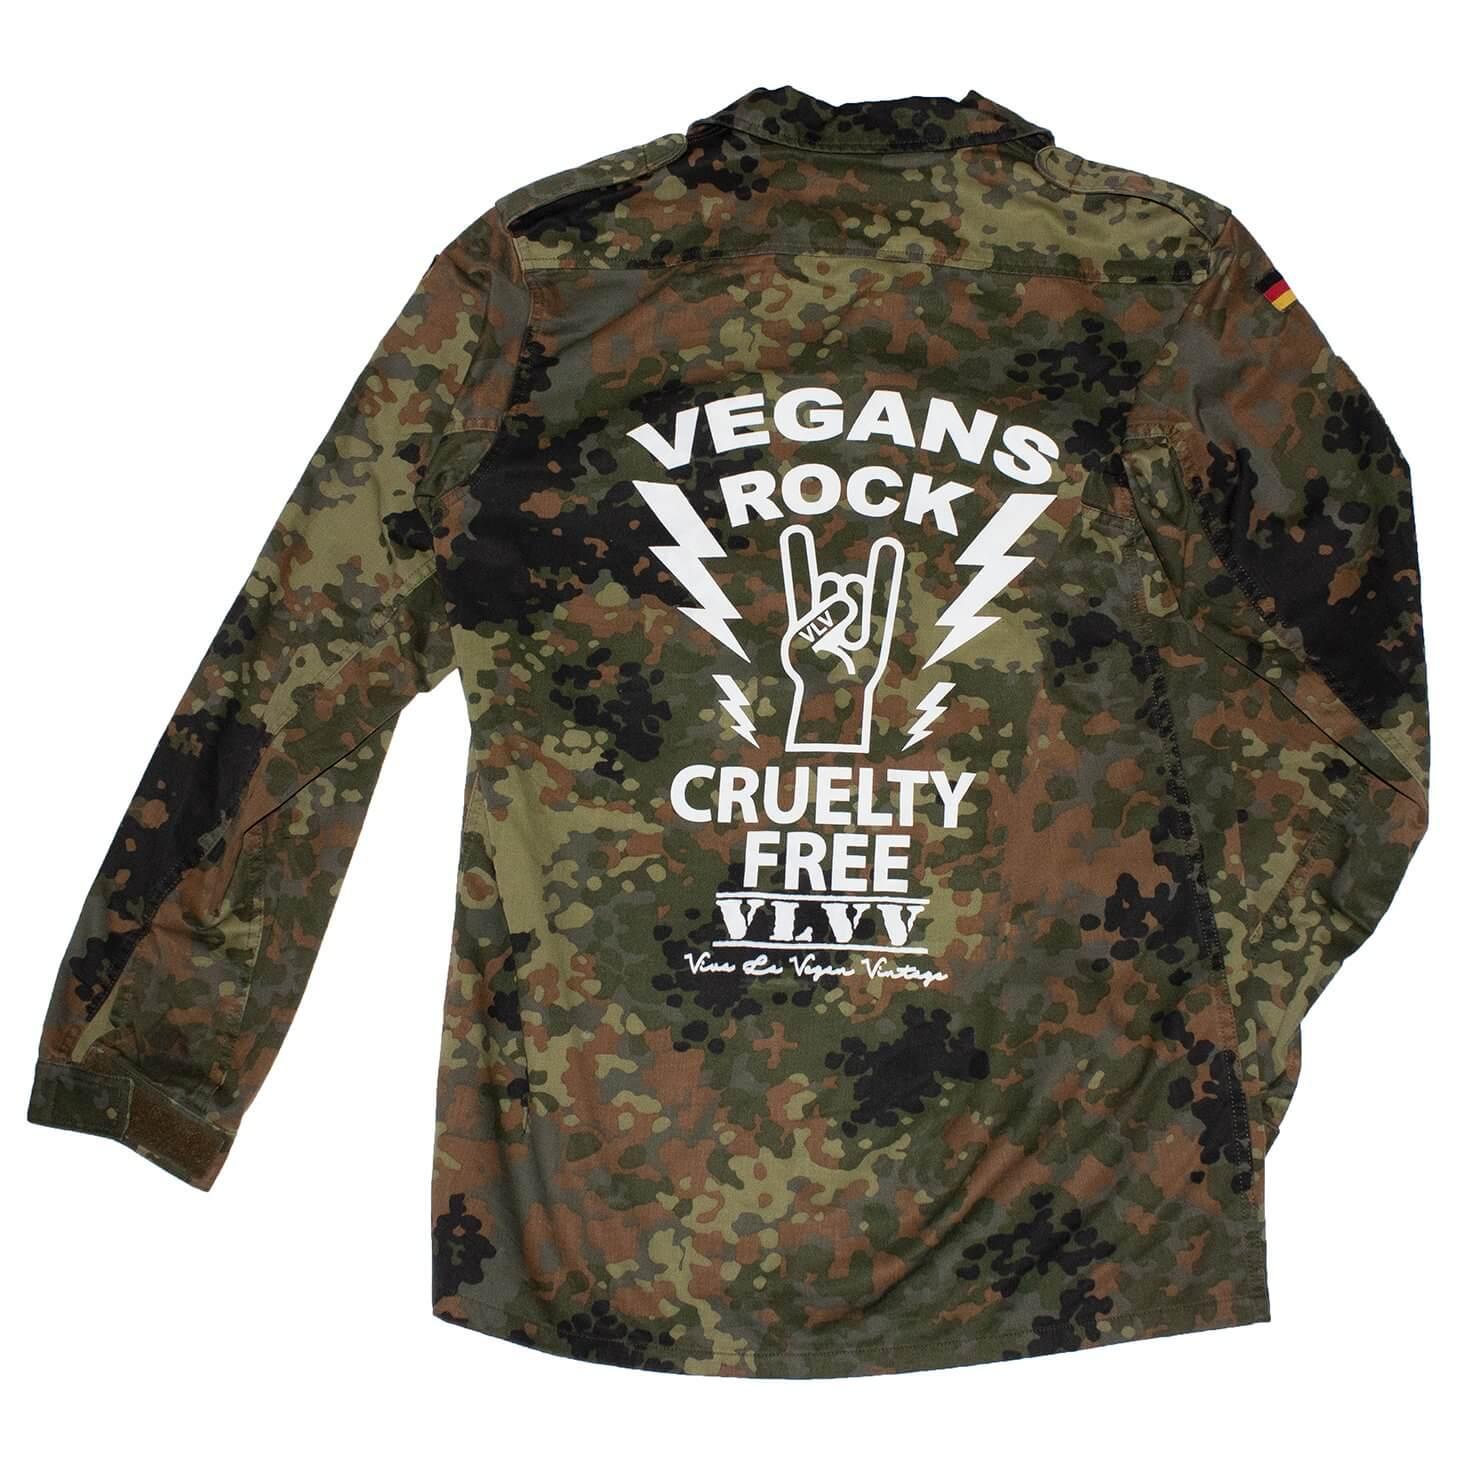 REWORKED VLVV: Army Surplus Camo : Vegans Rock (unisex)